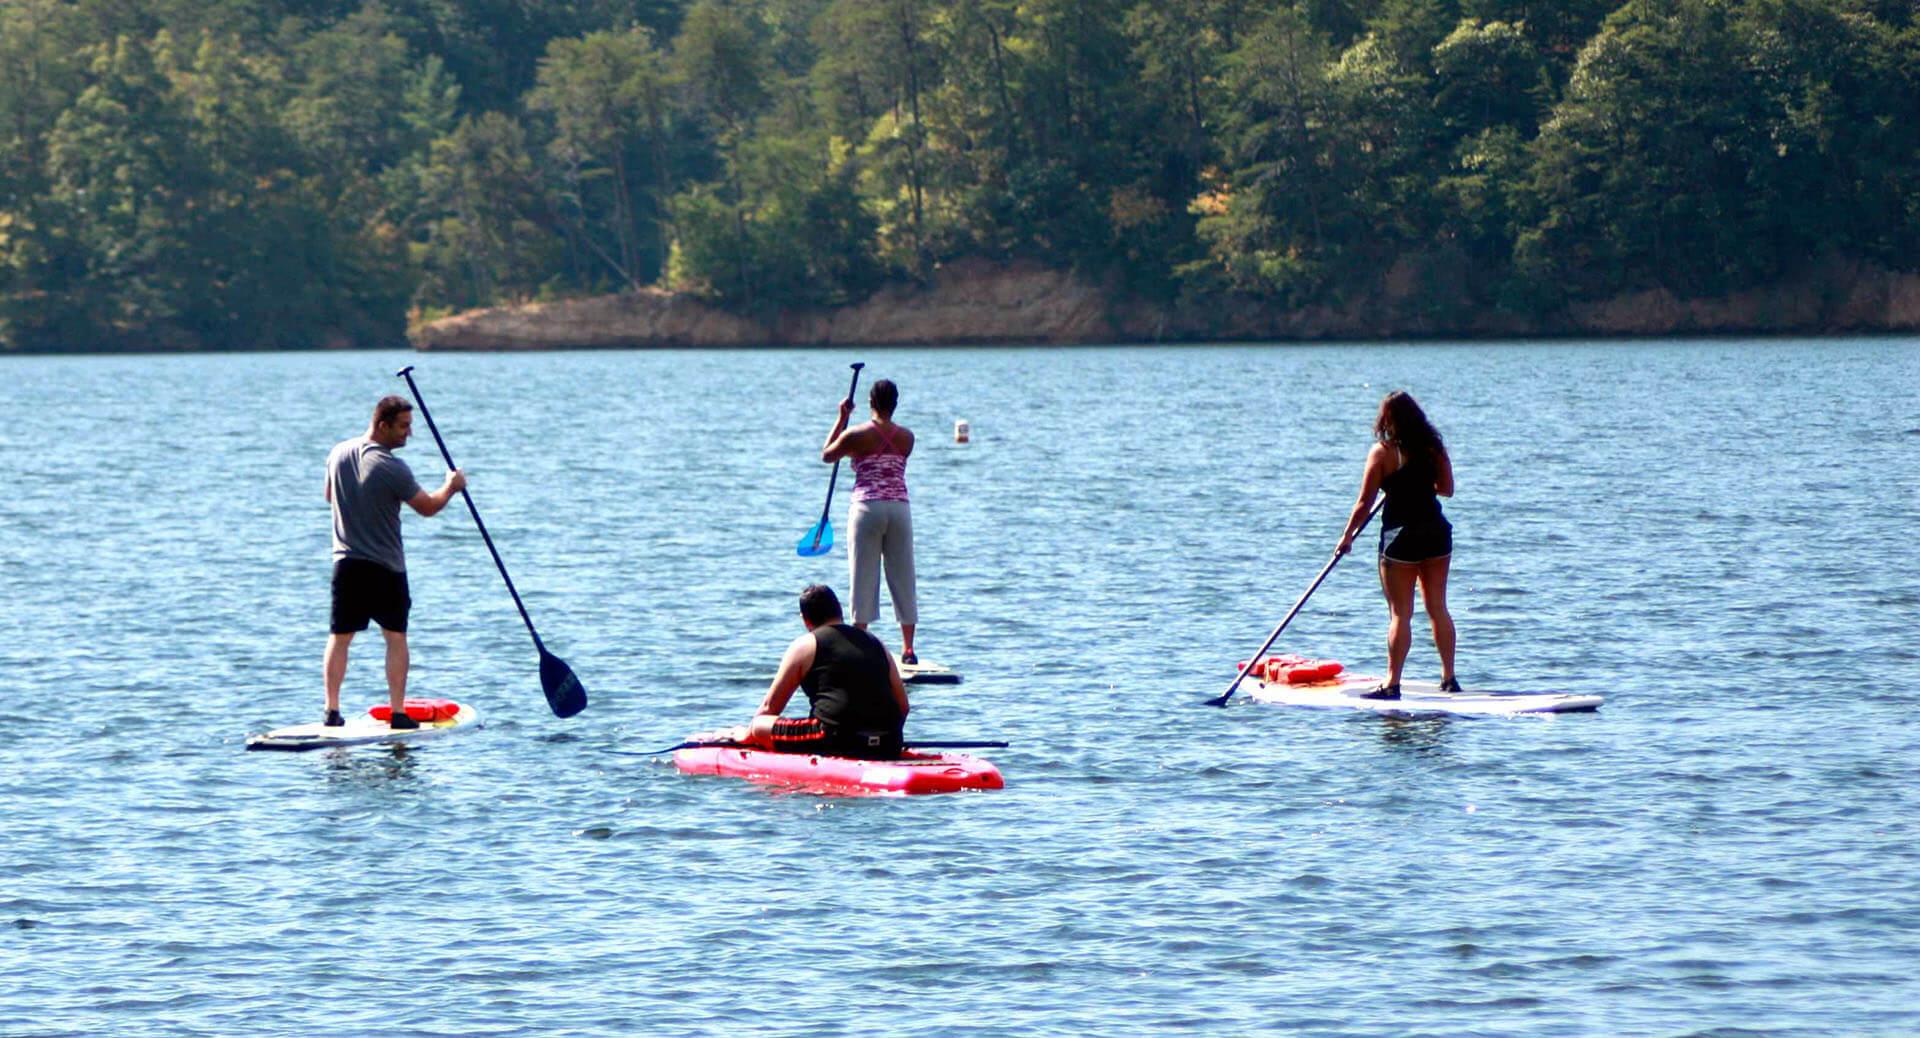 A group enjoys paddle boarding in Ocoee, TN